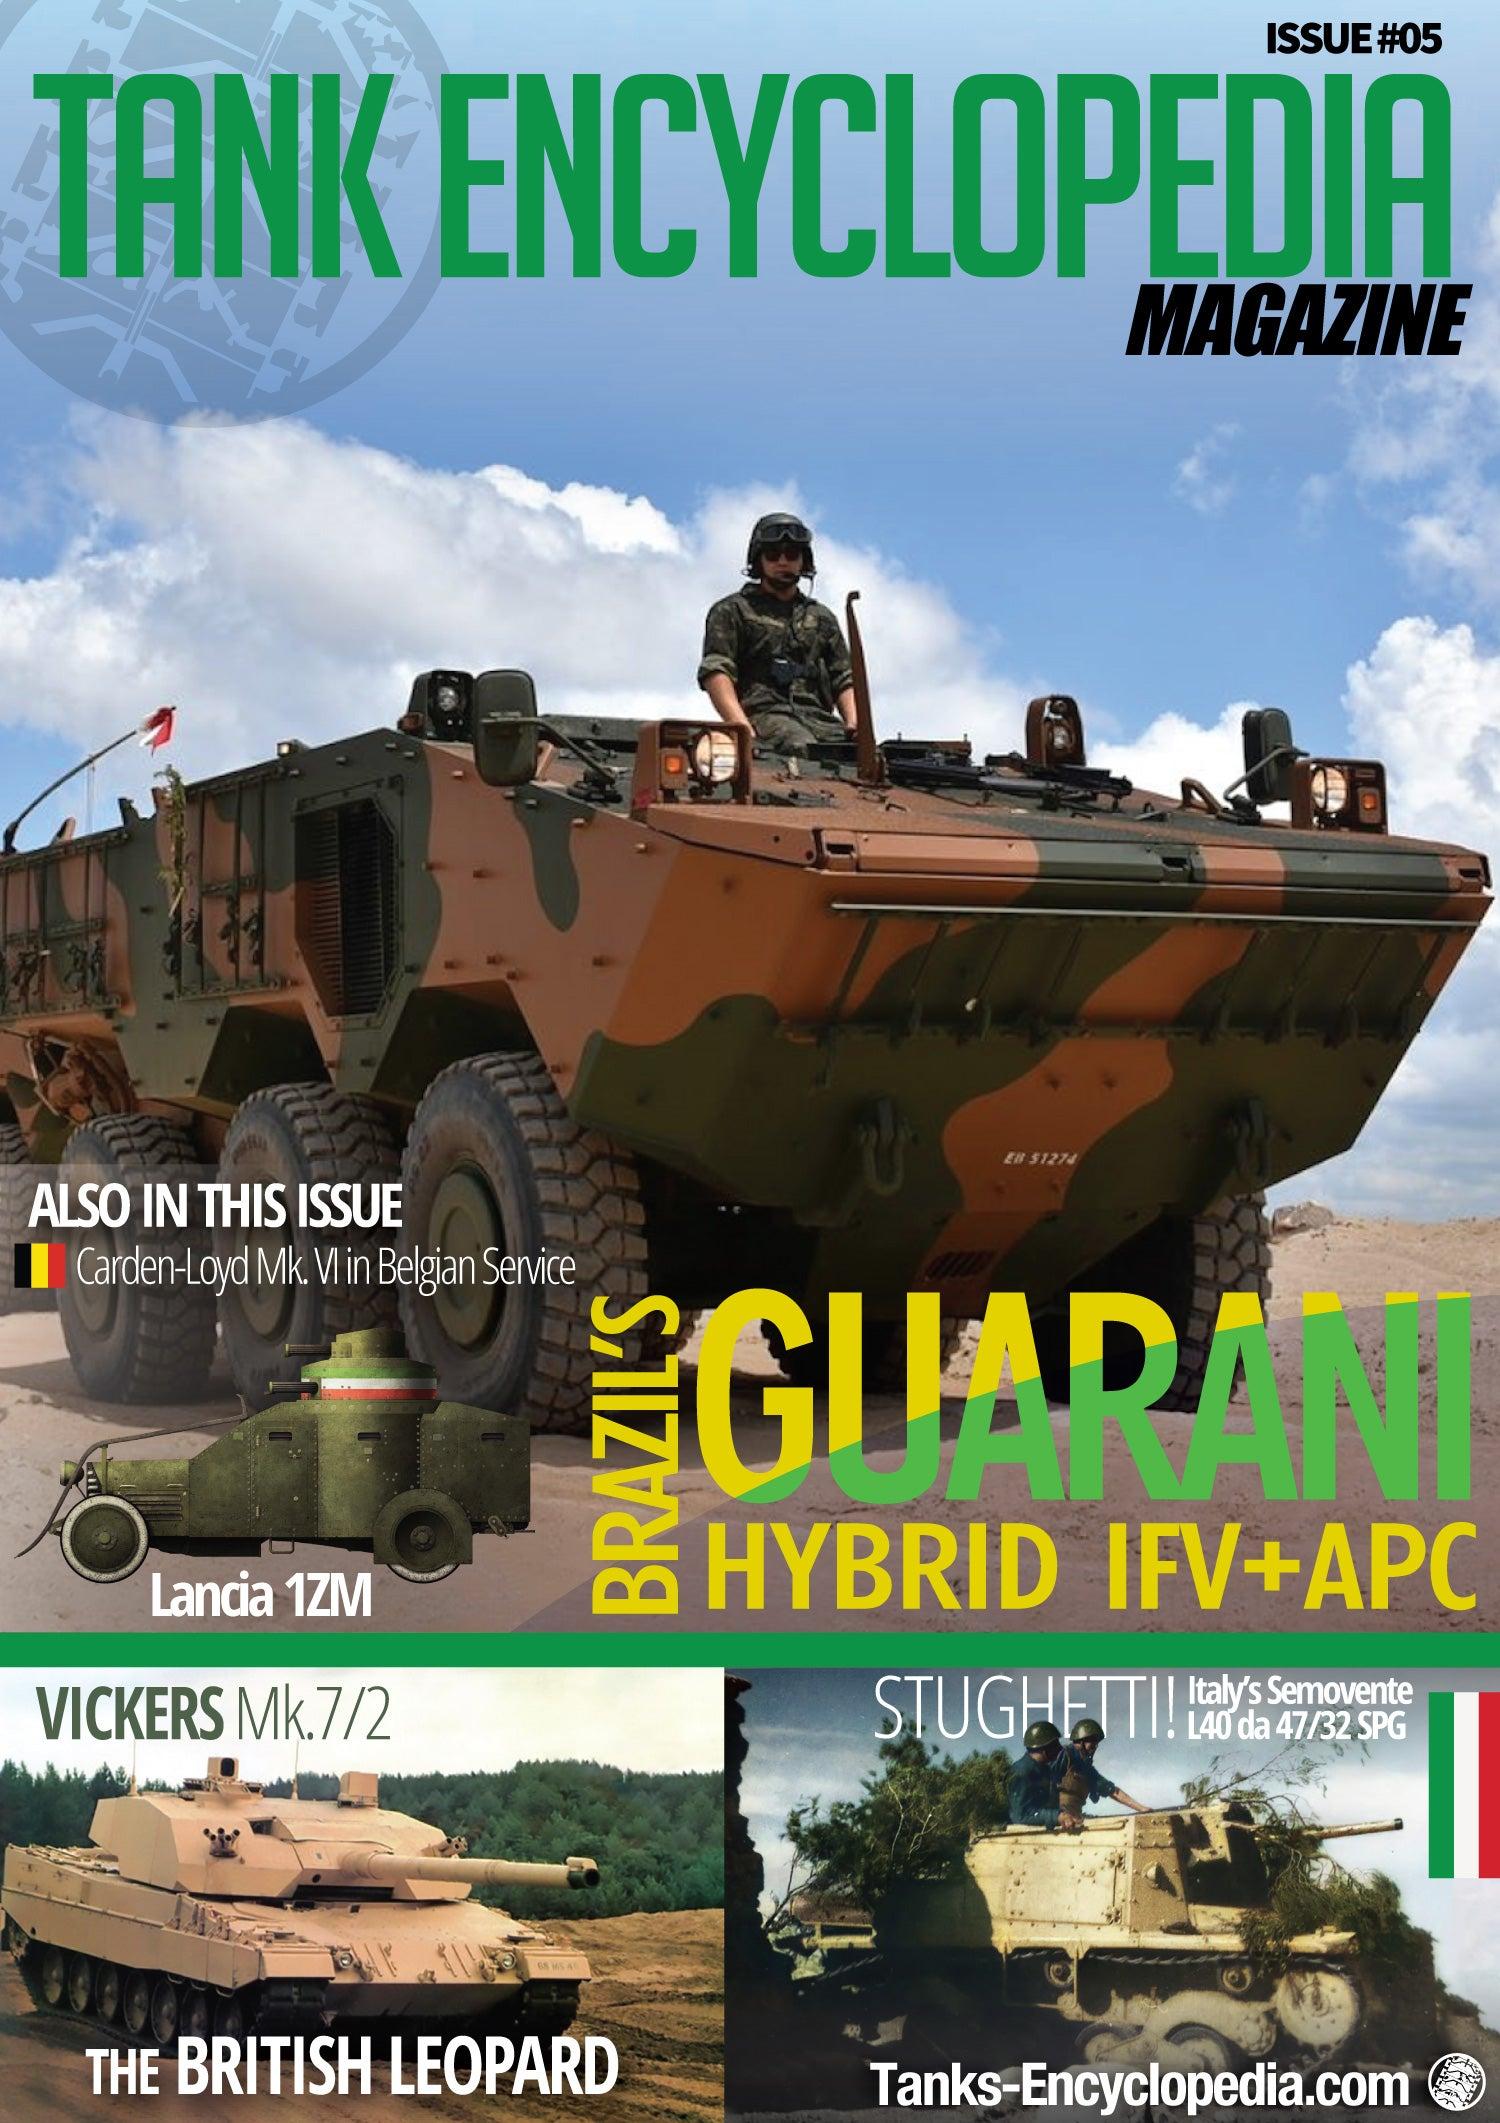 Tanks Encyclopedia Magazine, #4